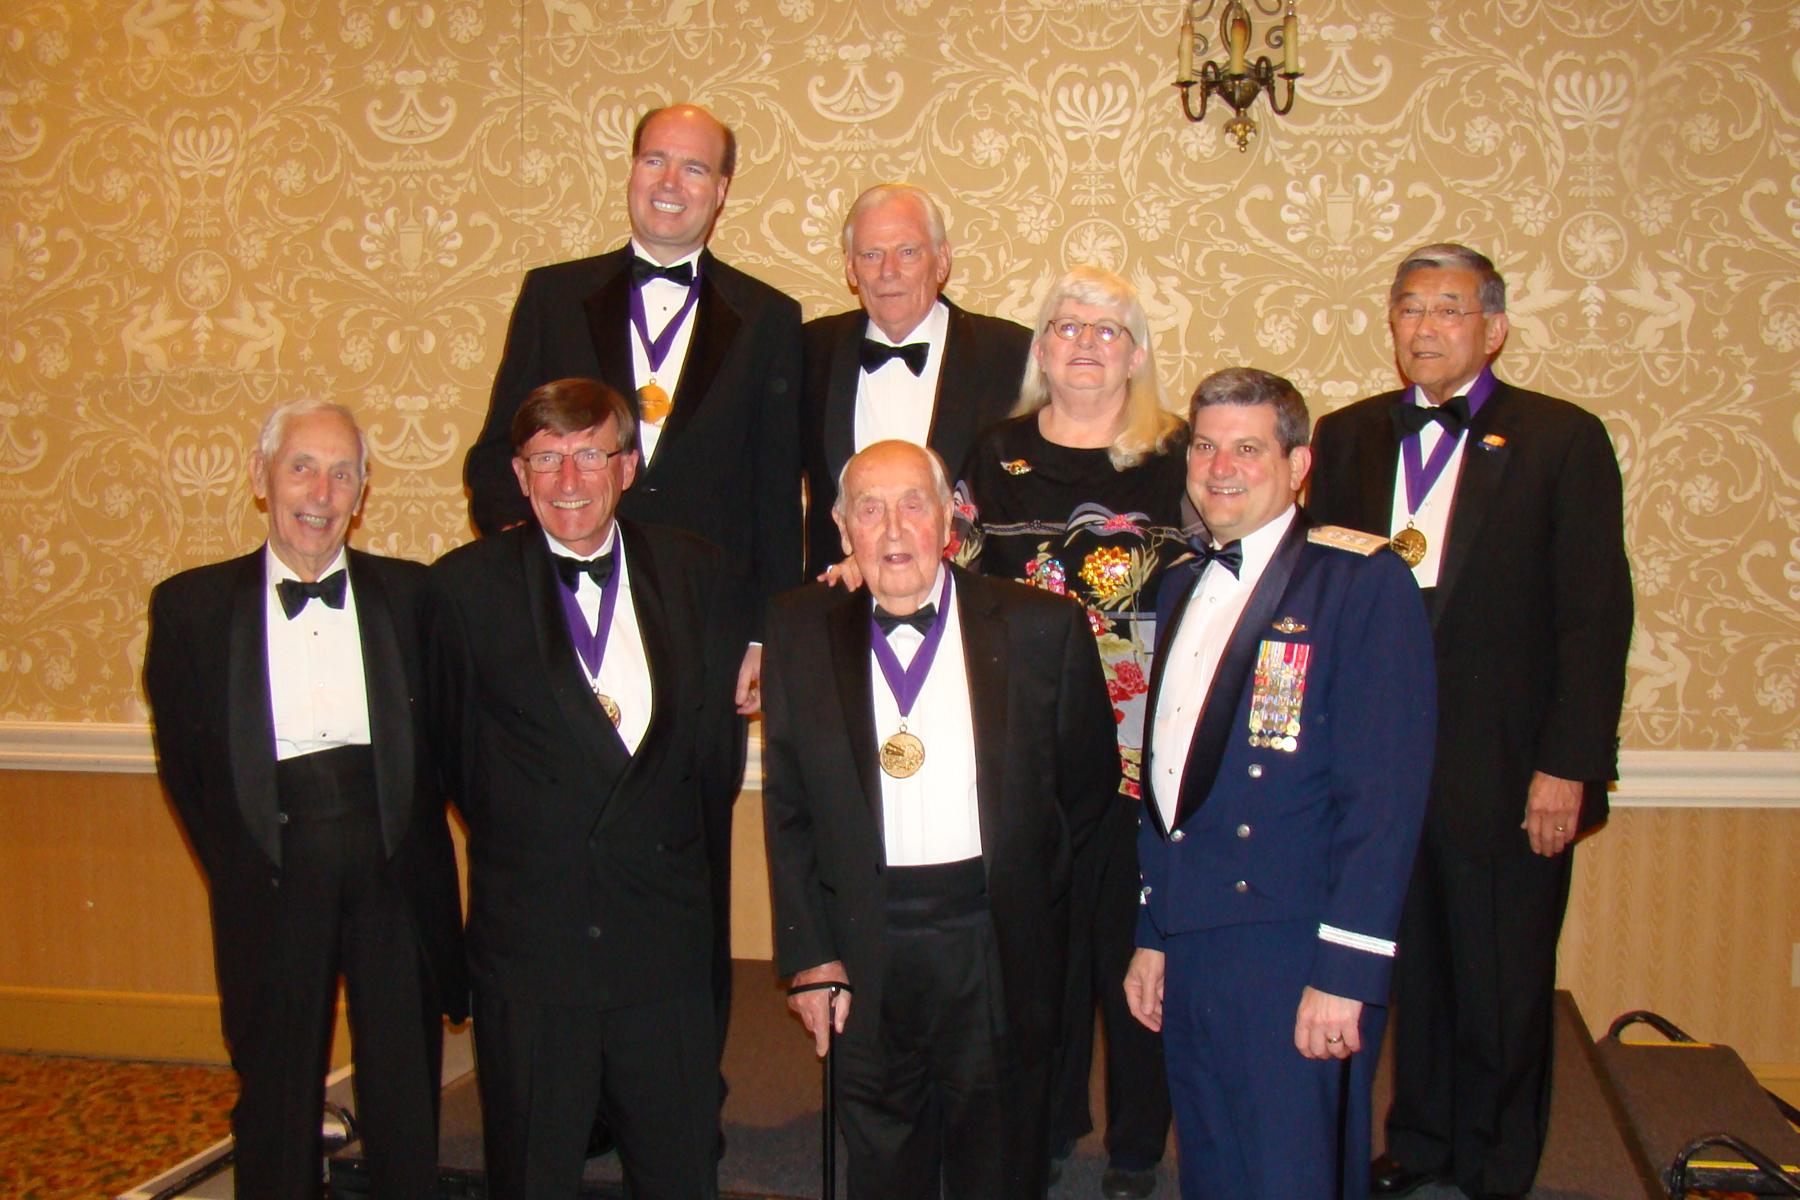 Tony Jannus Award Recipients (Top Row Kellner-Kelleher-Barrett-Mineta. Bottom Row Krusen-Kinnear-Hewitt-Findley, 30 Oct '08.jpg